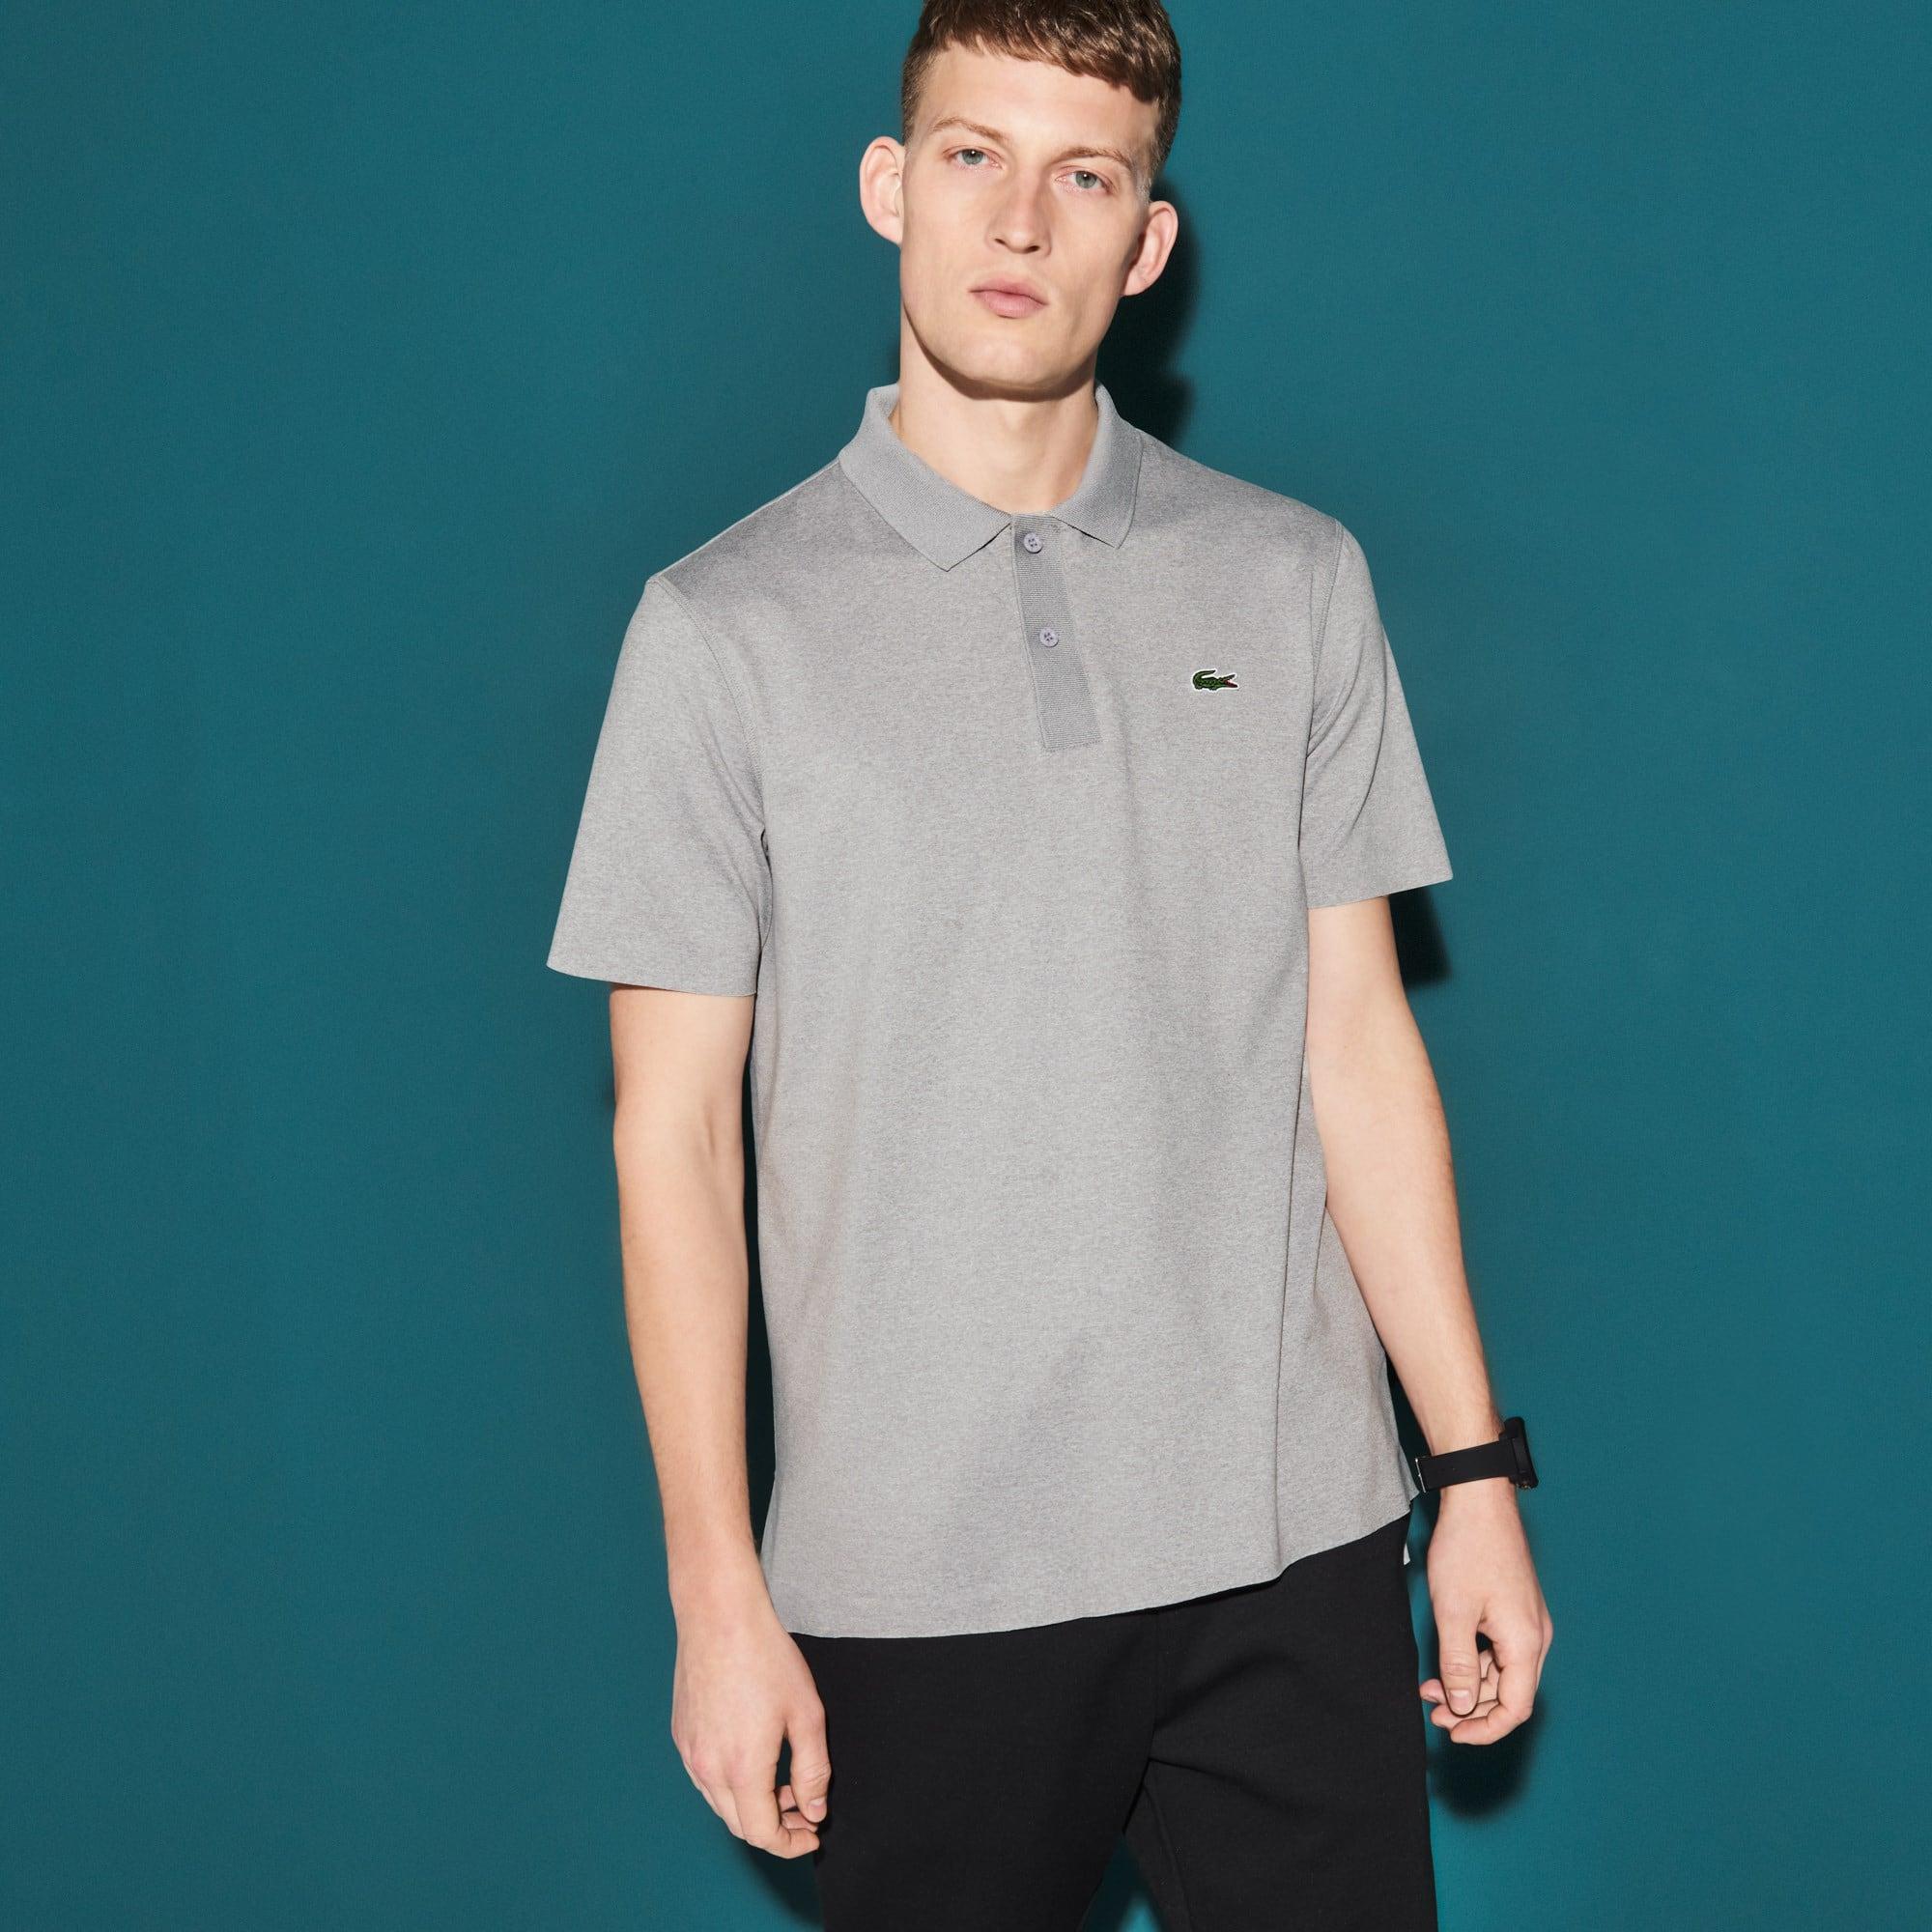 Men's Lacoste SPORT Flecked Stretch Jersey Tennis Polo Shirt